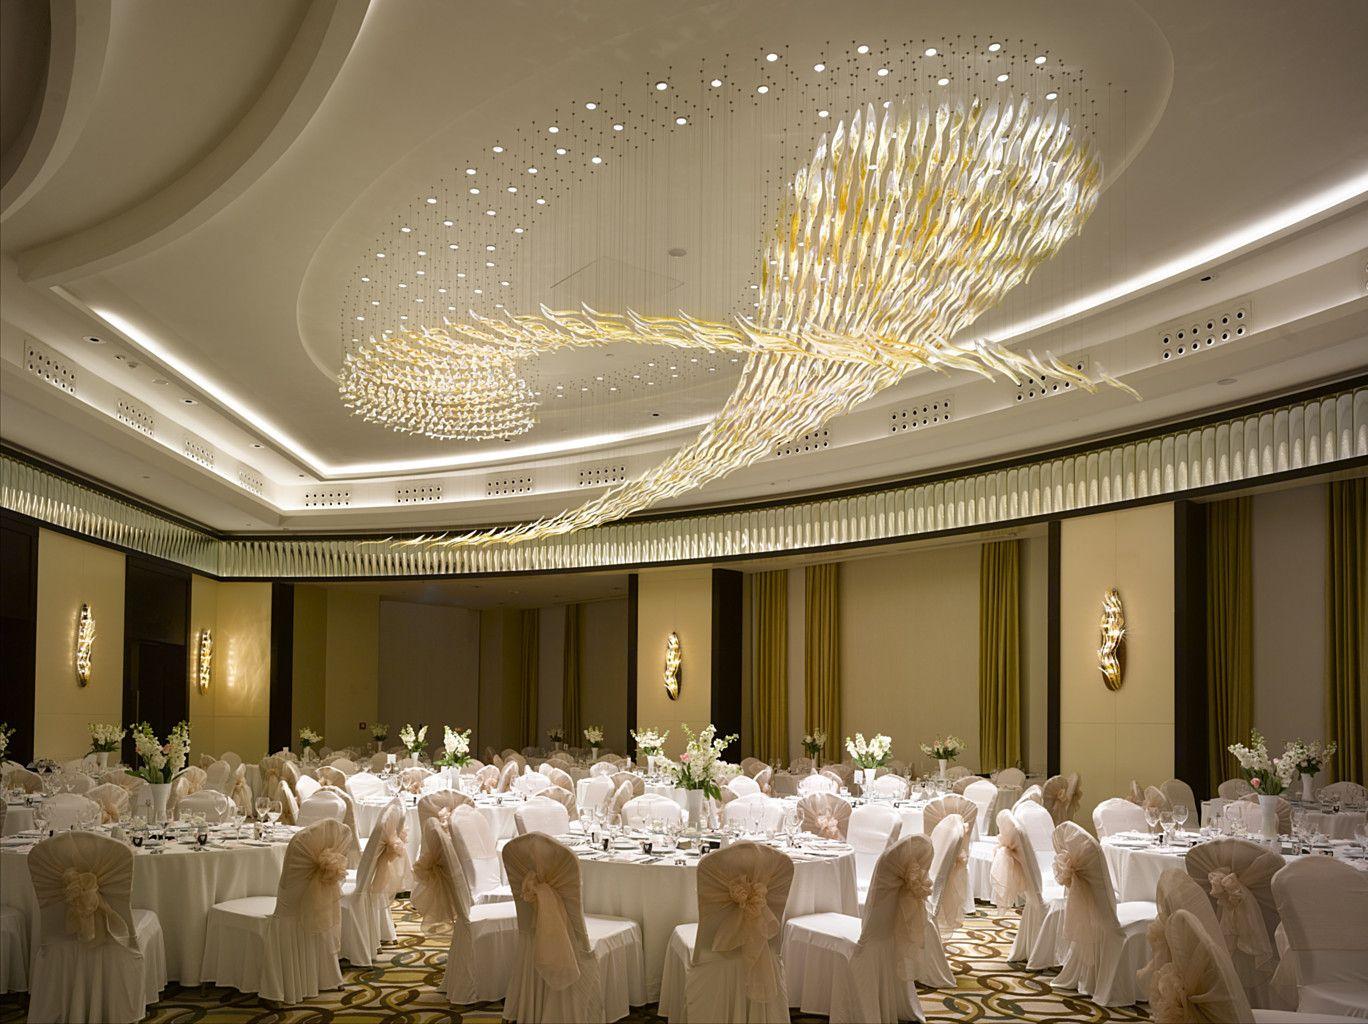 Wyndham Istanbul Petek Hotel by Lasvit | Luxury lighting design, Ceiling  light design, Ballroom design